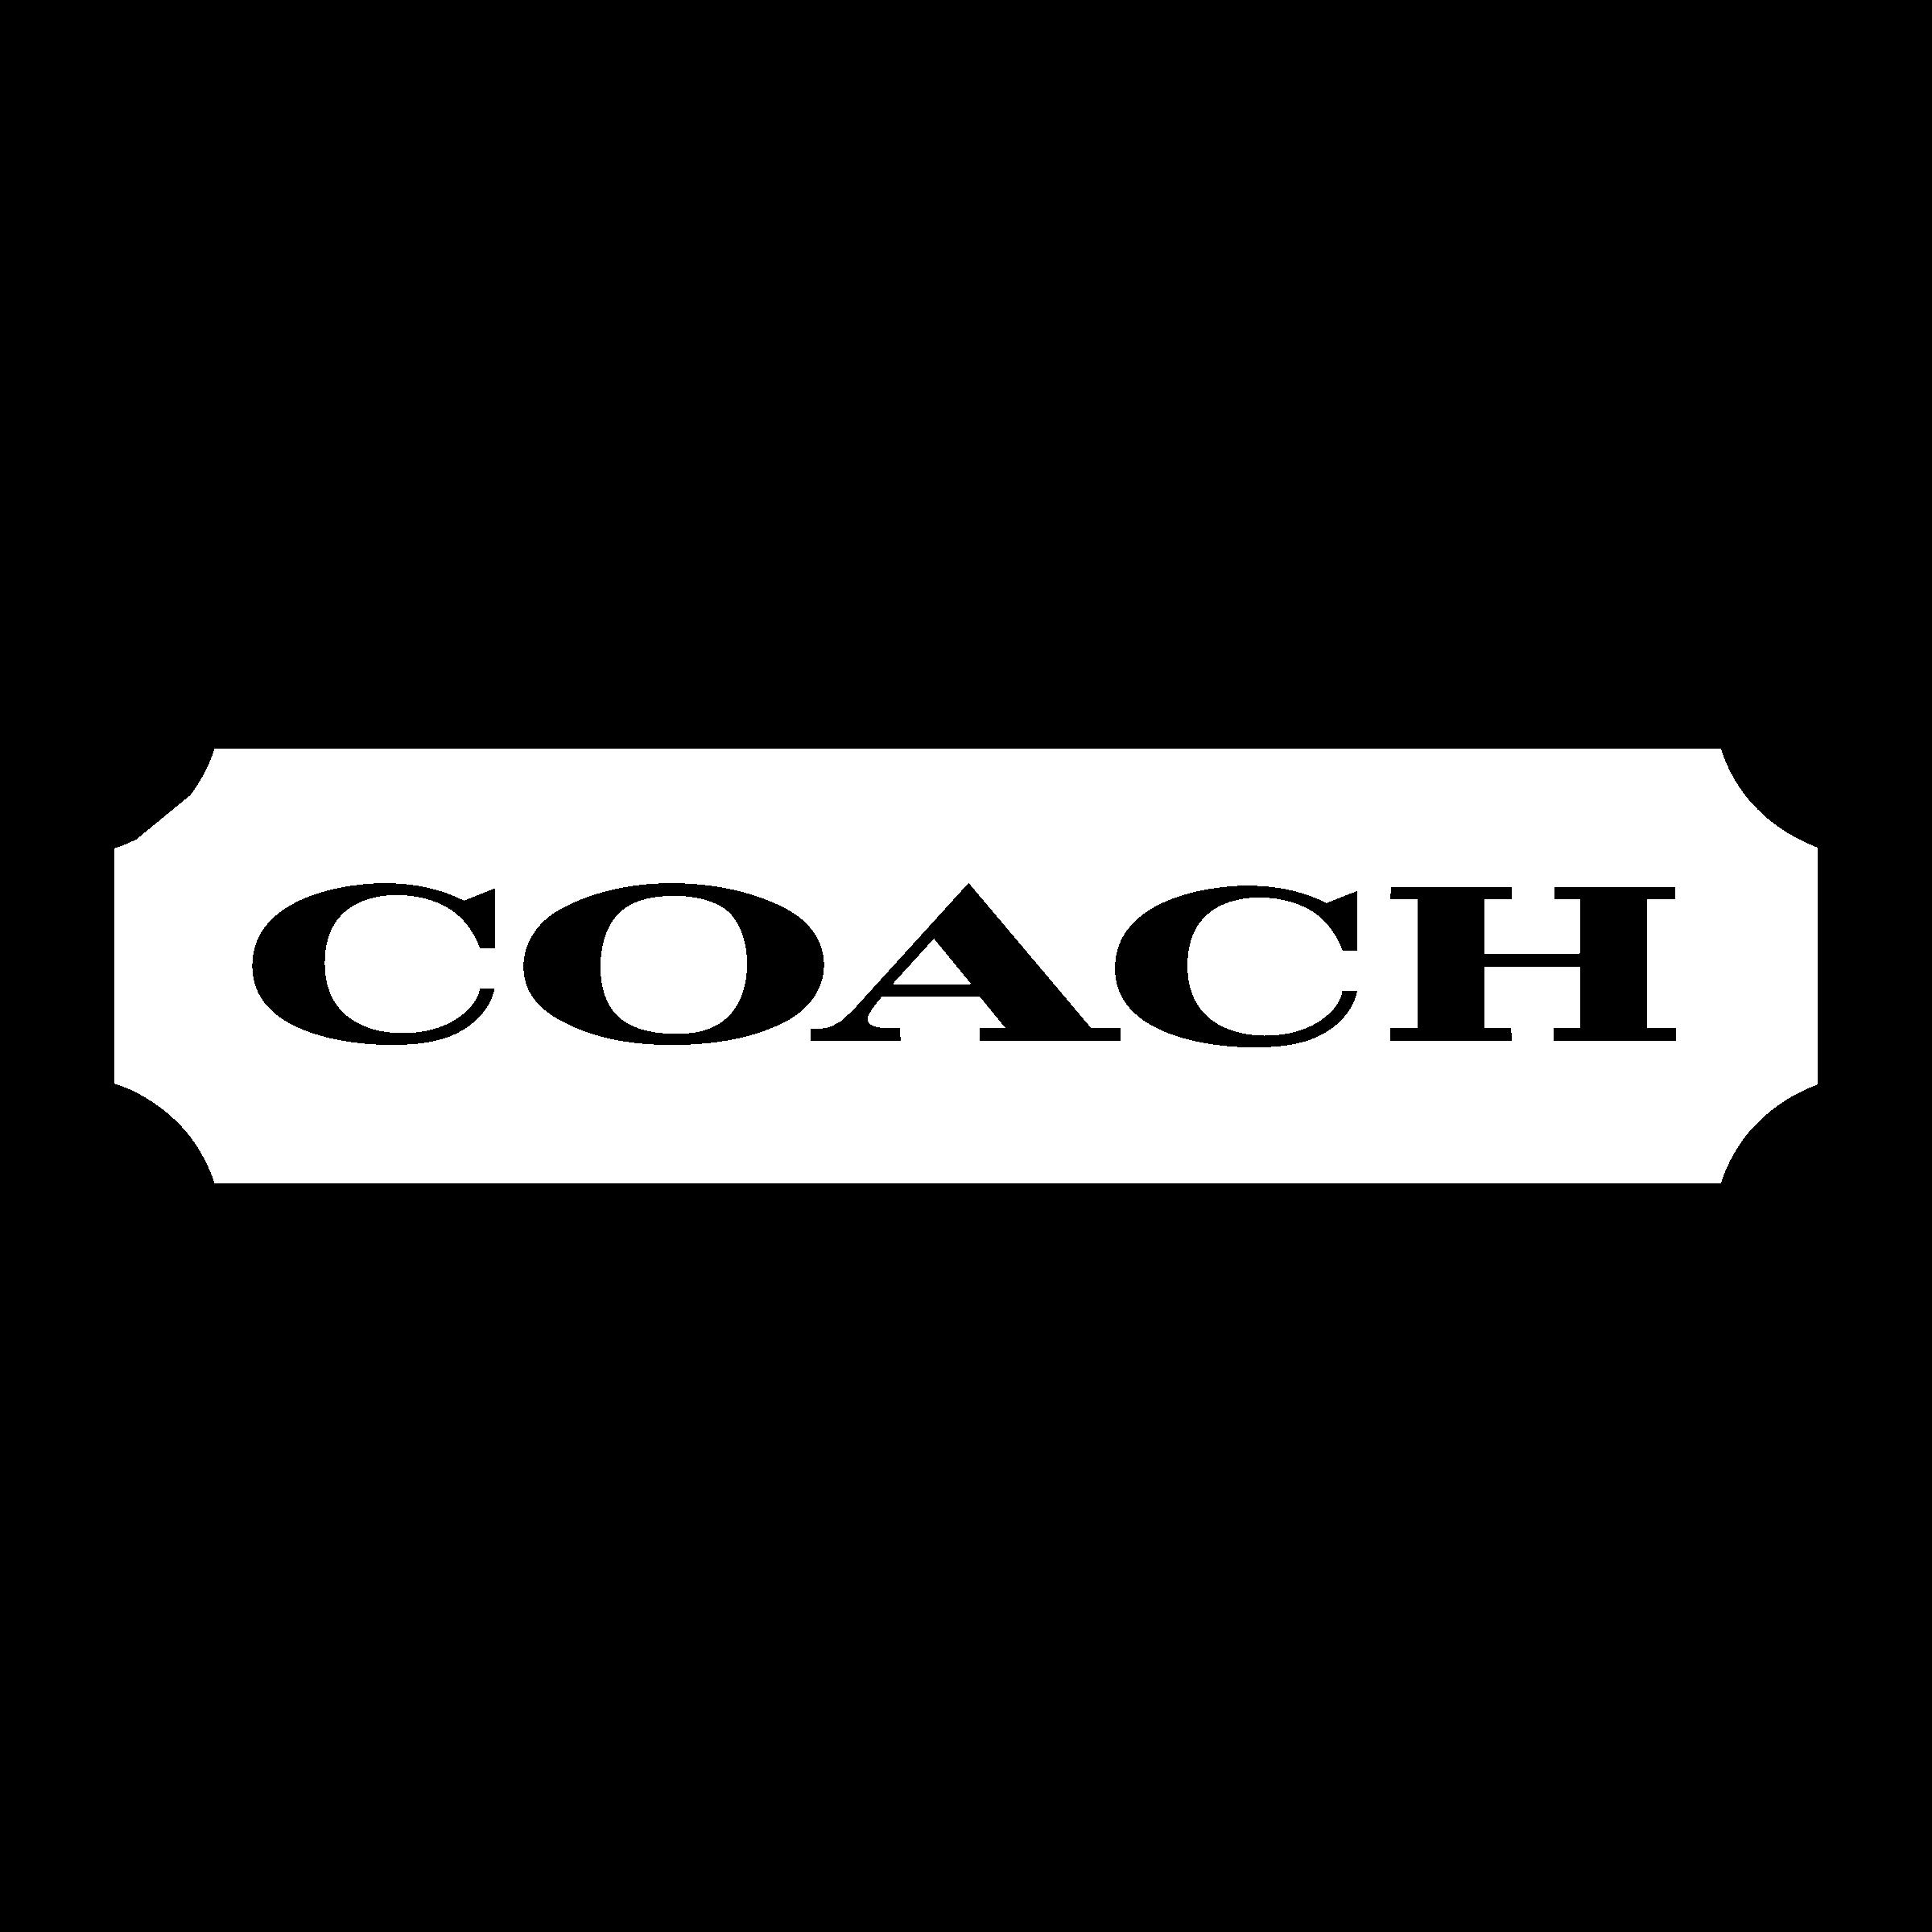 Coach Logo PNG Transparent & SVG Vector - Freebie Supply